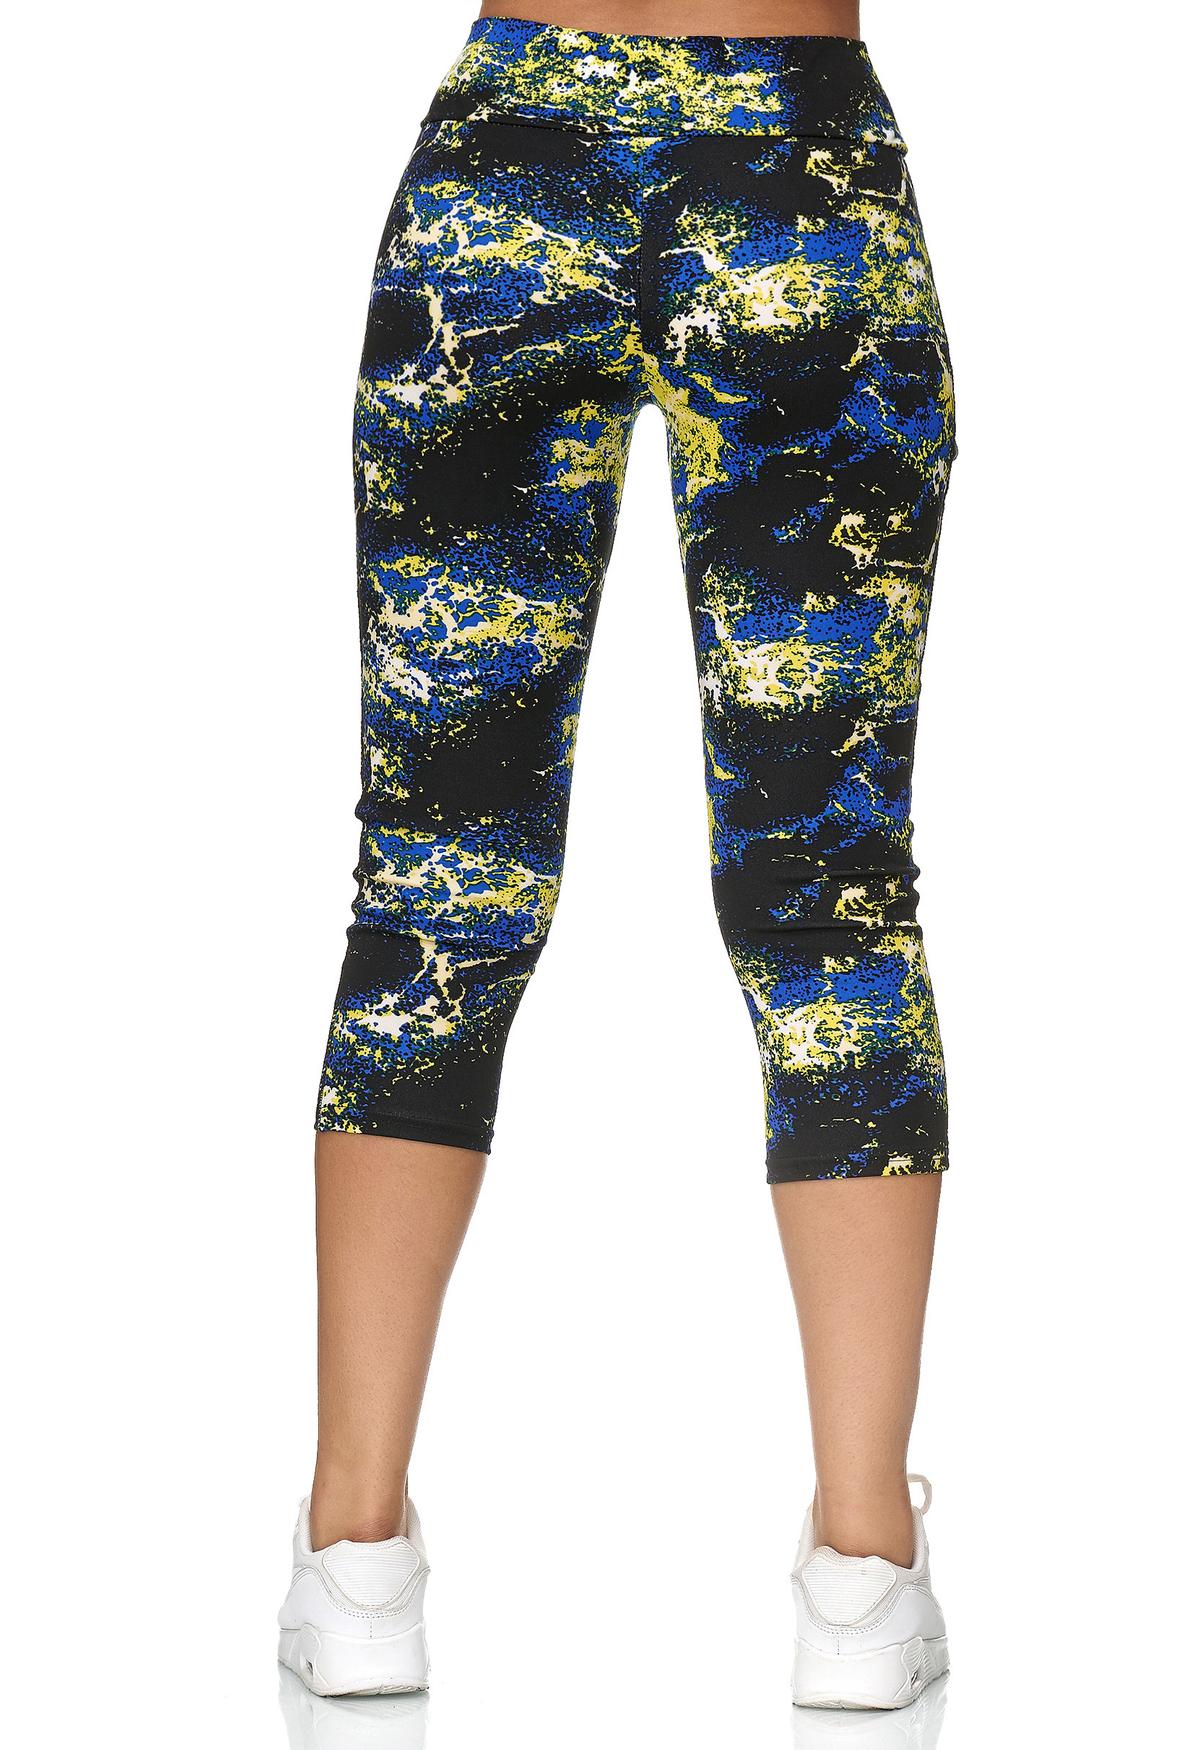 Damen Mesh Sport Leggings Capri Hose Bunt 7/8 Fitness ...